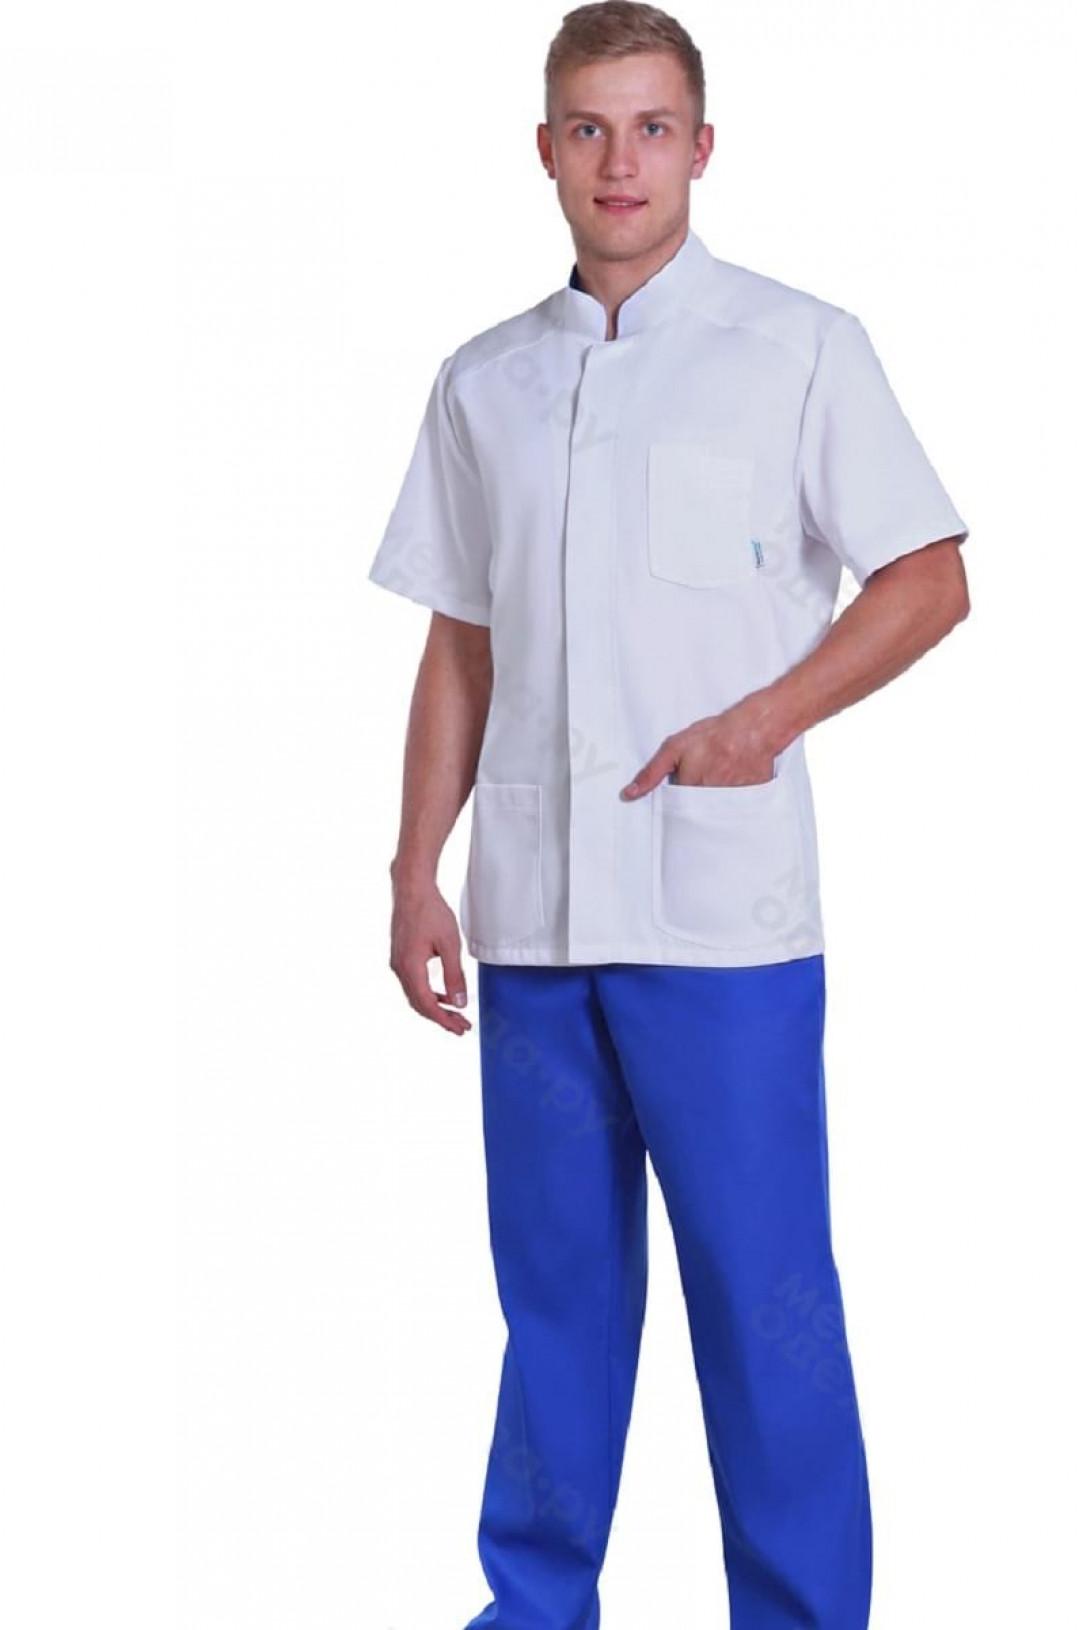 Костюм медицинский мужской 750 (белый/синий 13, тиси)